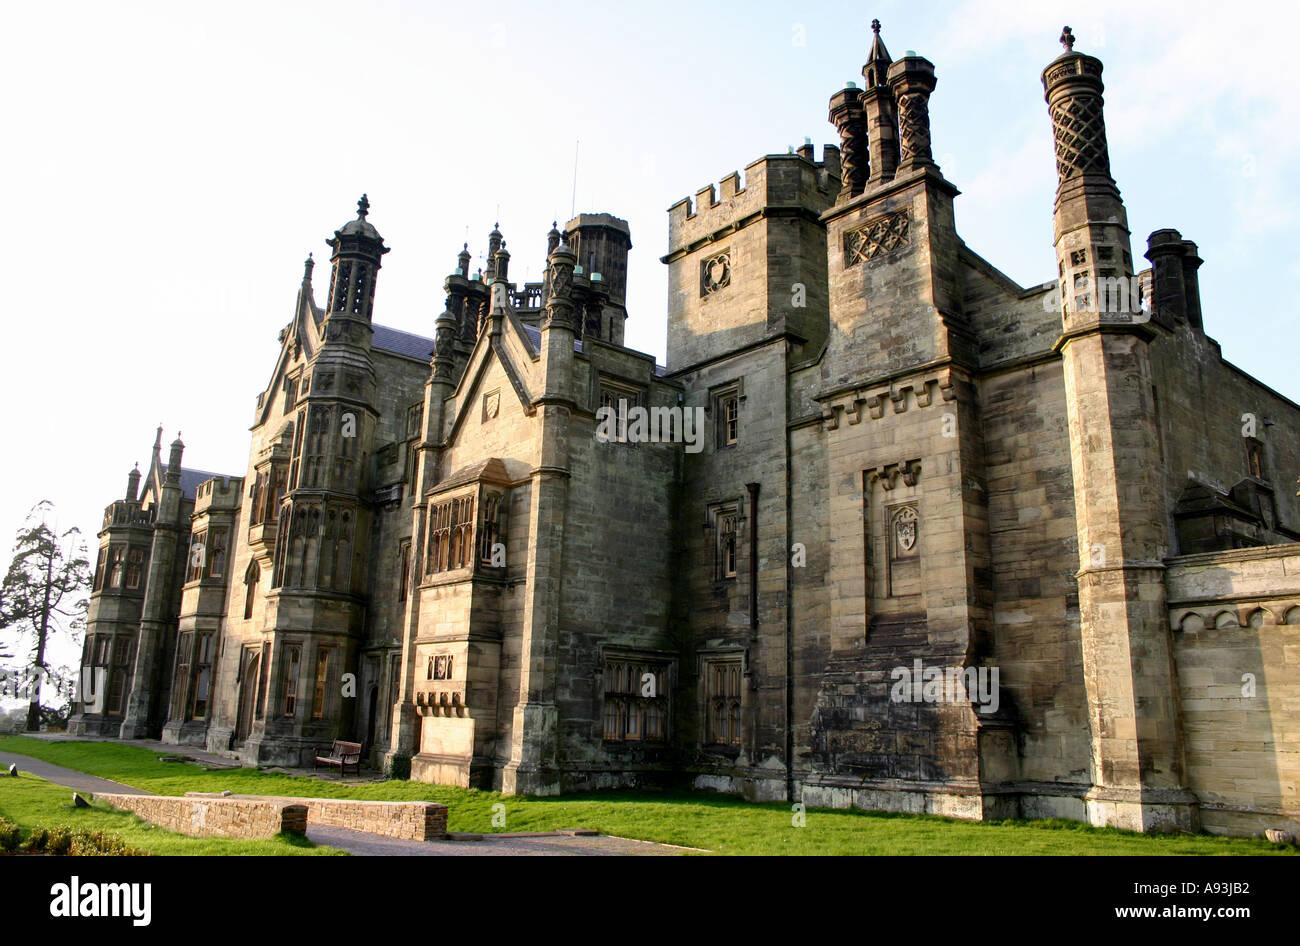 tudor gothic style victorian mansion house stock photo 3995313 alamy